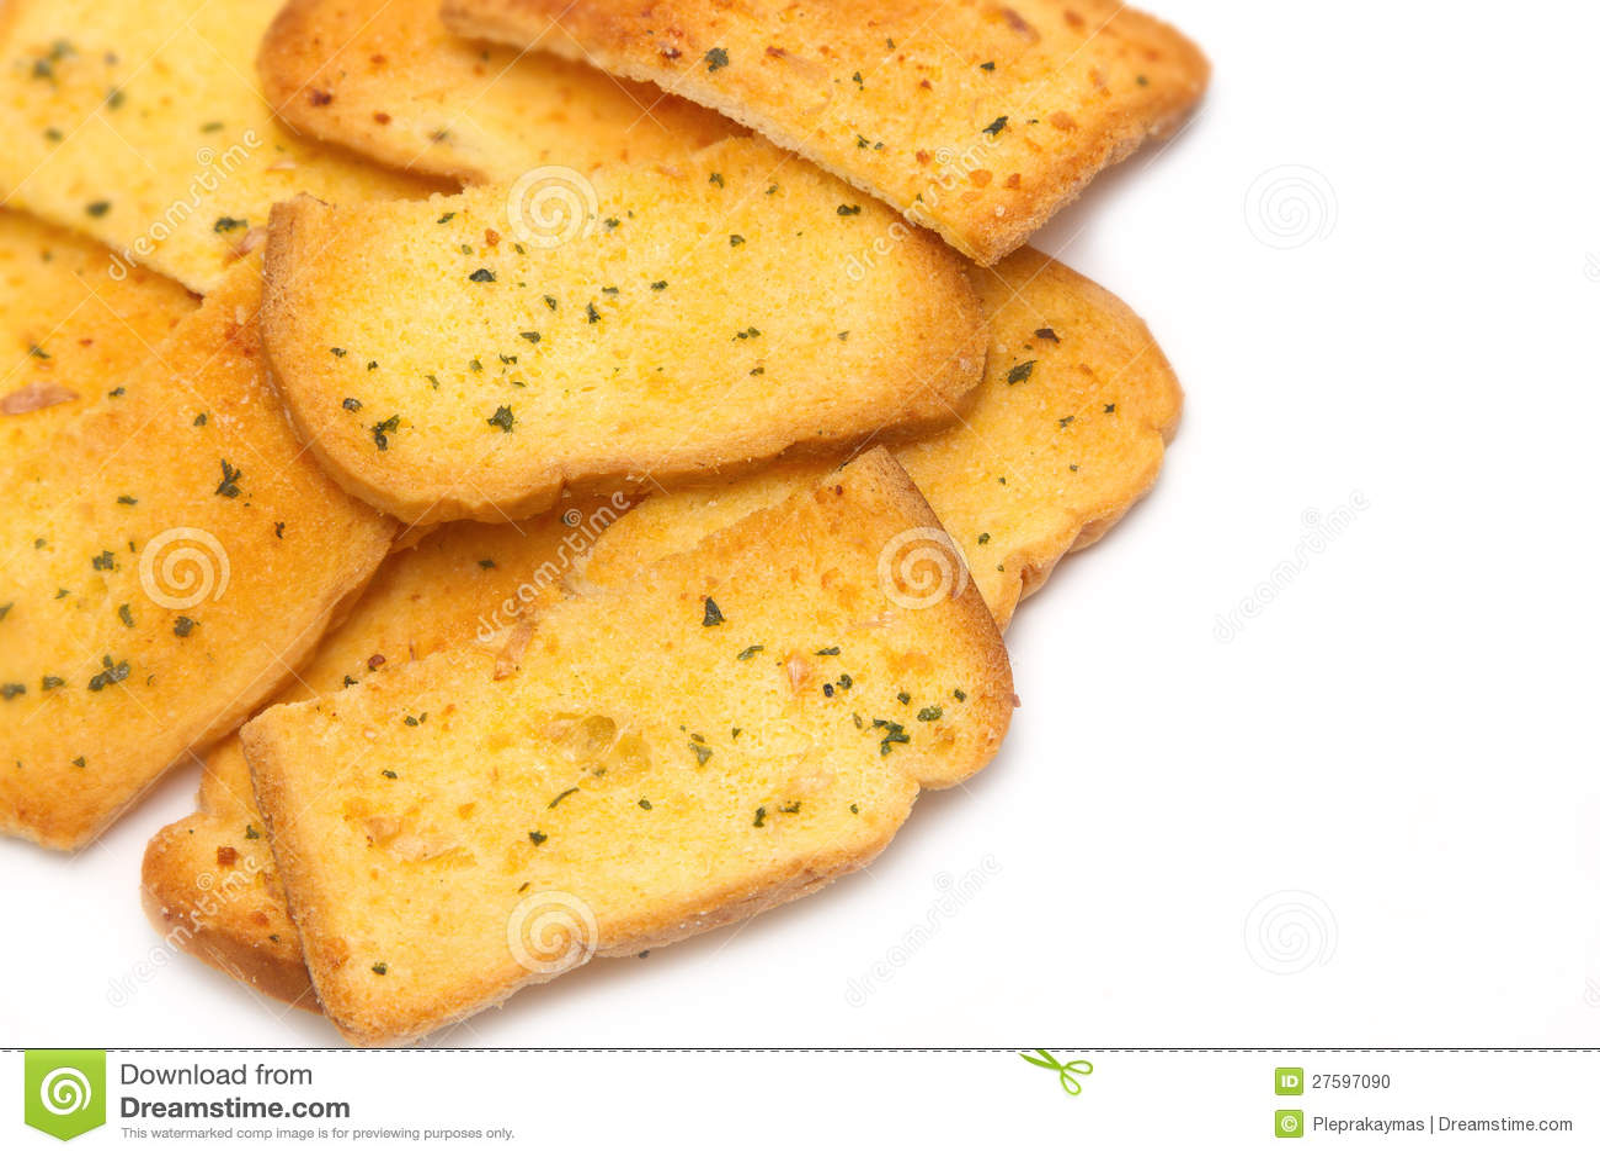 Crispy Garlic Bread Stock Photo - Image: 27597090